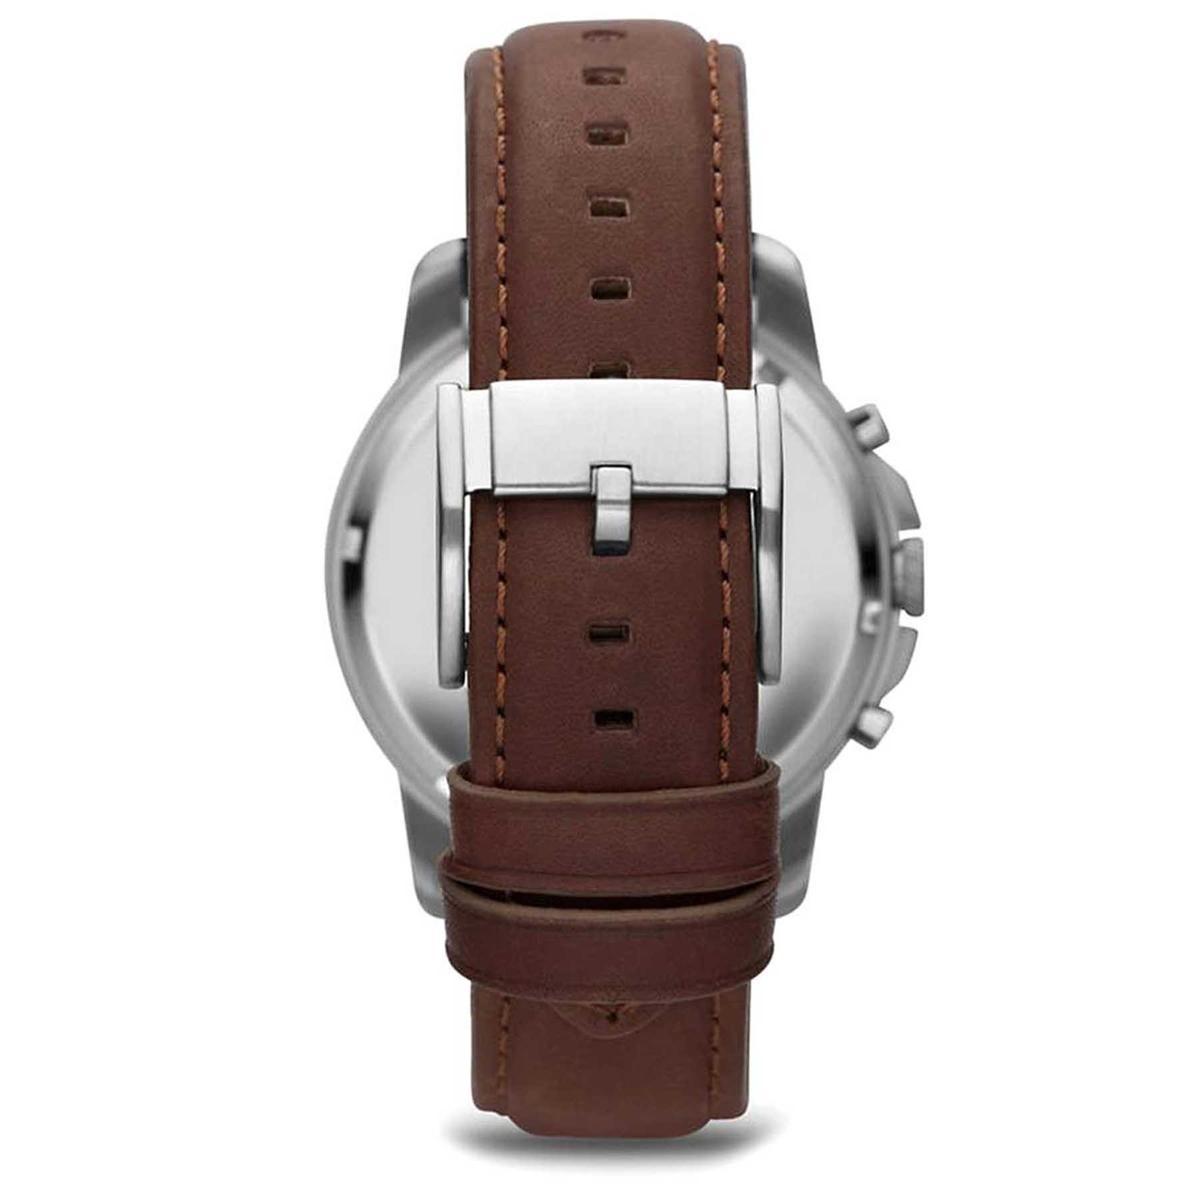 Relógio Fossil Grant Cronógrafo Analógico Masculino FS4813 0PN Produto não  disponível 9f116d7697